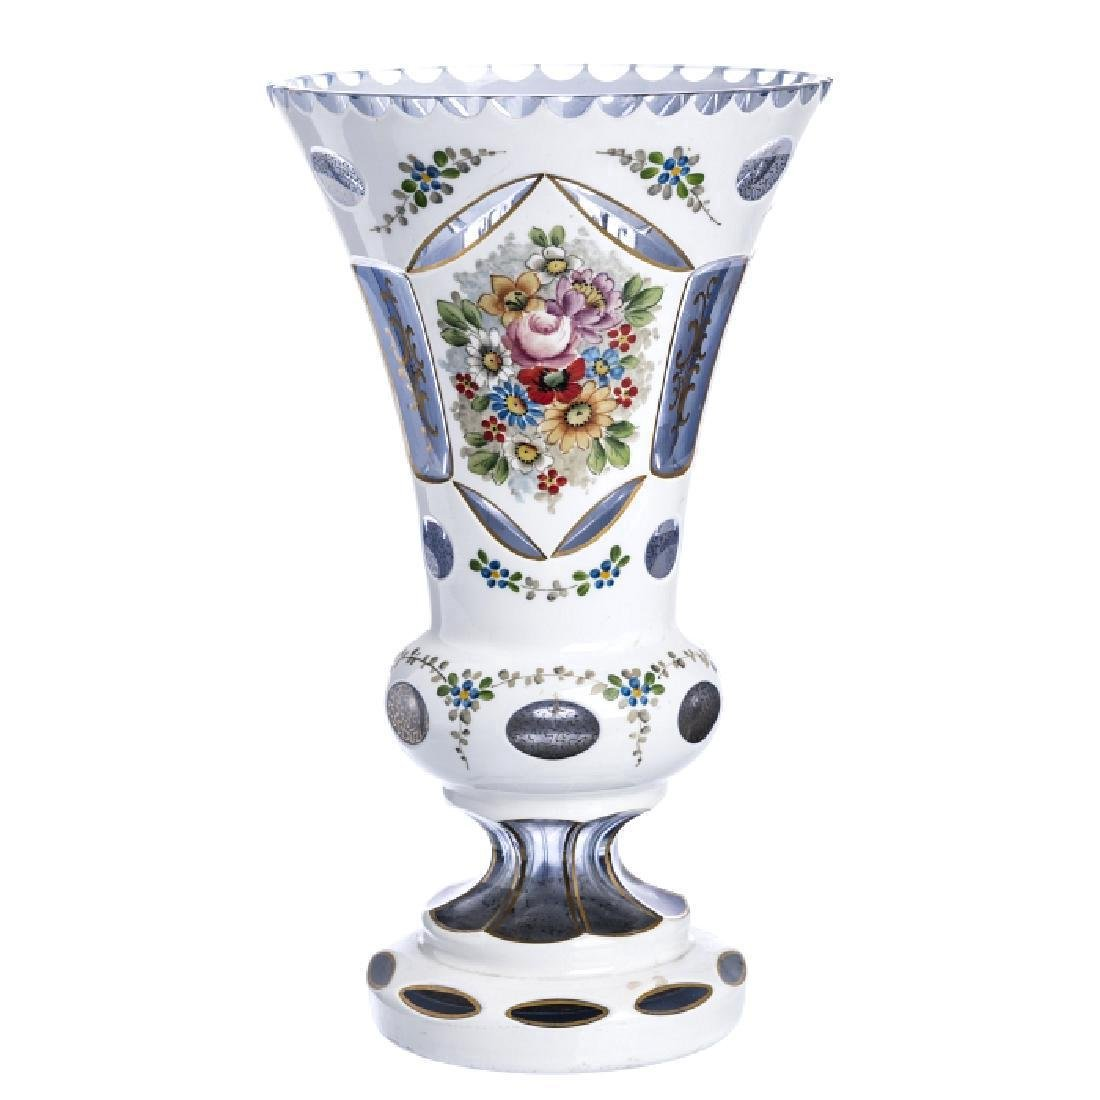 Bohemian Cut Glass Floral Enameled Vase